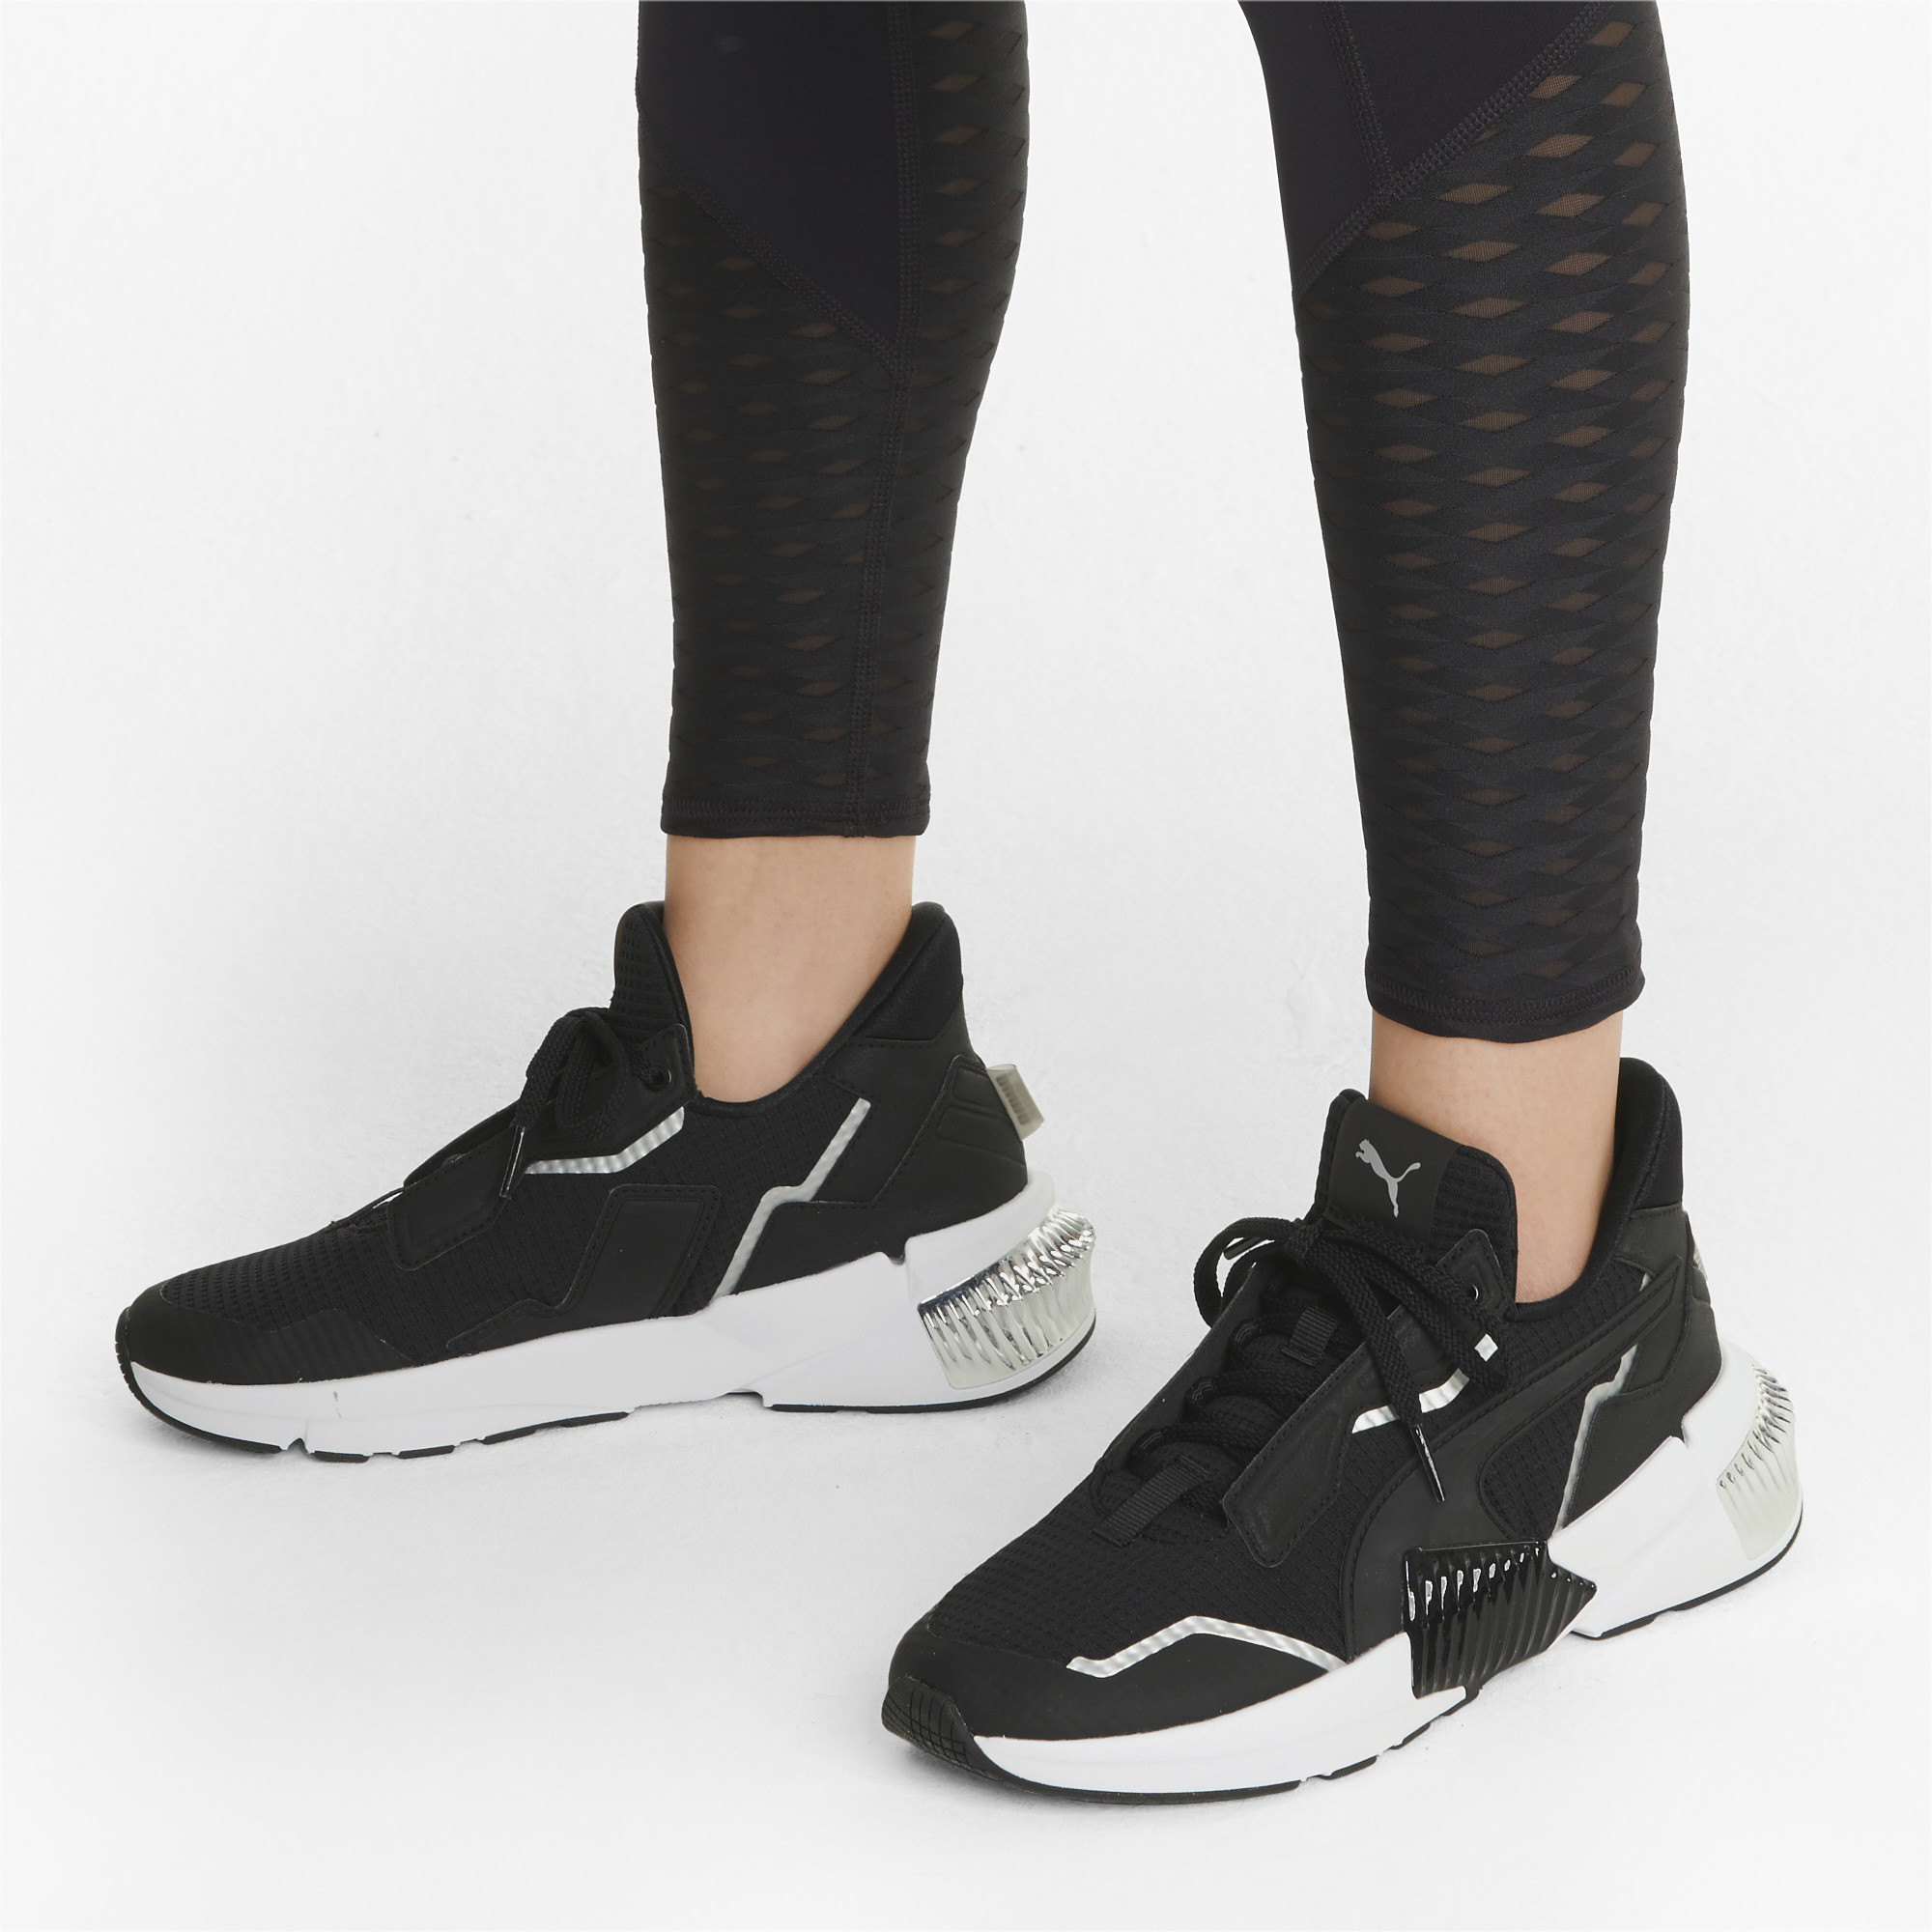 Indexbild 20 - PUMA Provoke XT Damen Trainingsschuhe Frauen Stiefelette Training Neu